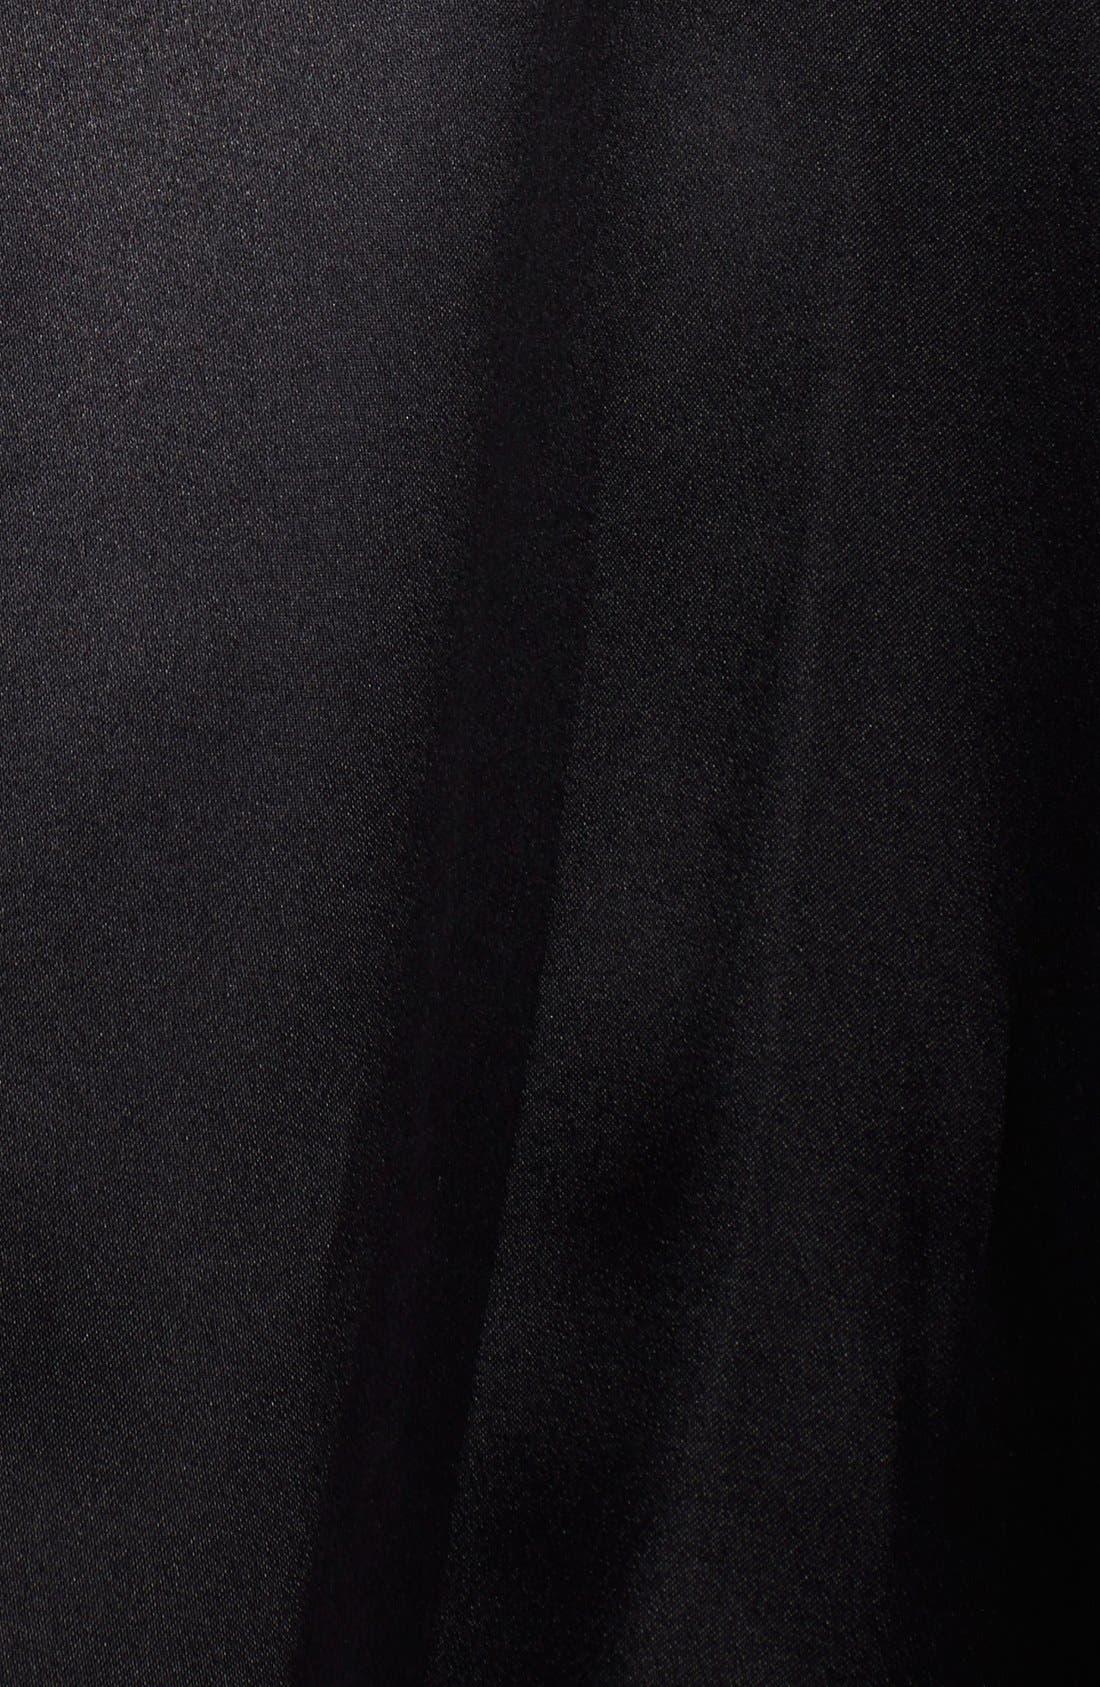 ST. JOHN COLLECTION,                             Satin Face Silk Organza Ballgown Skirt,                             Alternate thumbnail 4, color,                             001